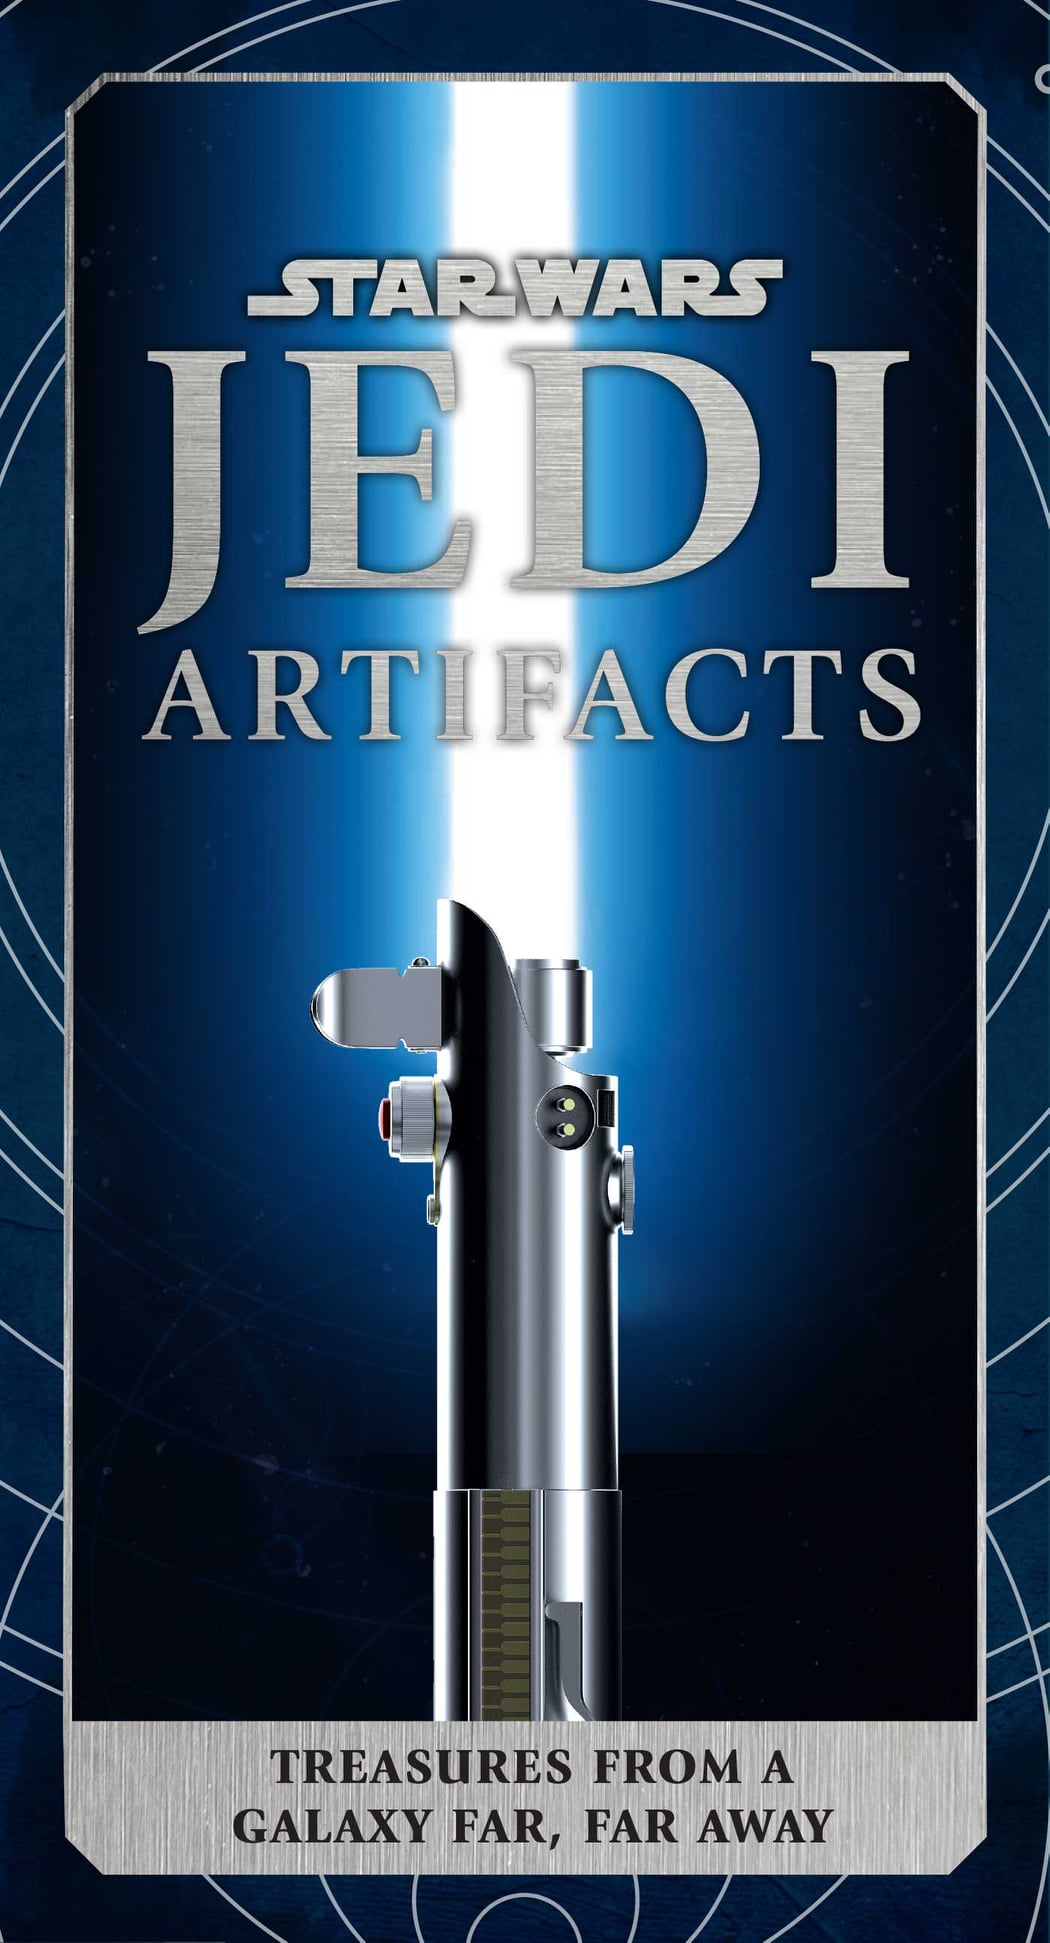 Star Wars: Jedi Artifacts